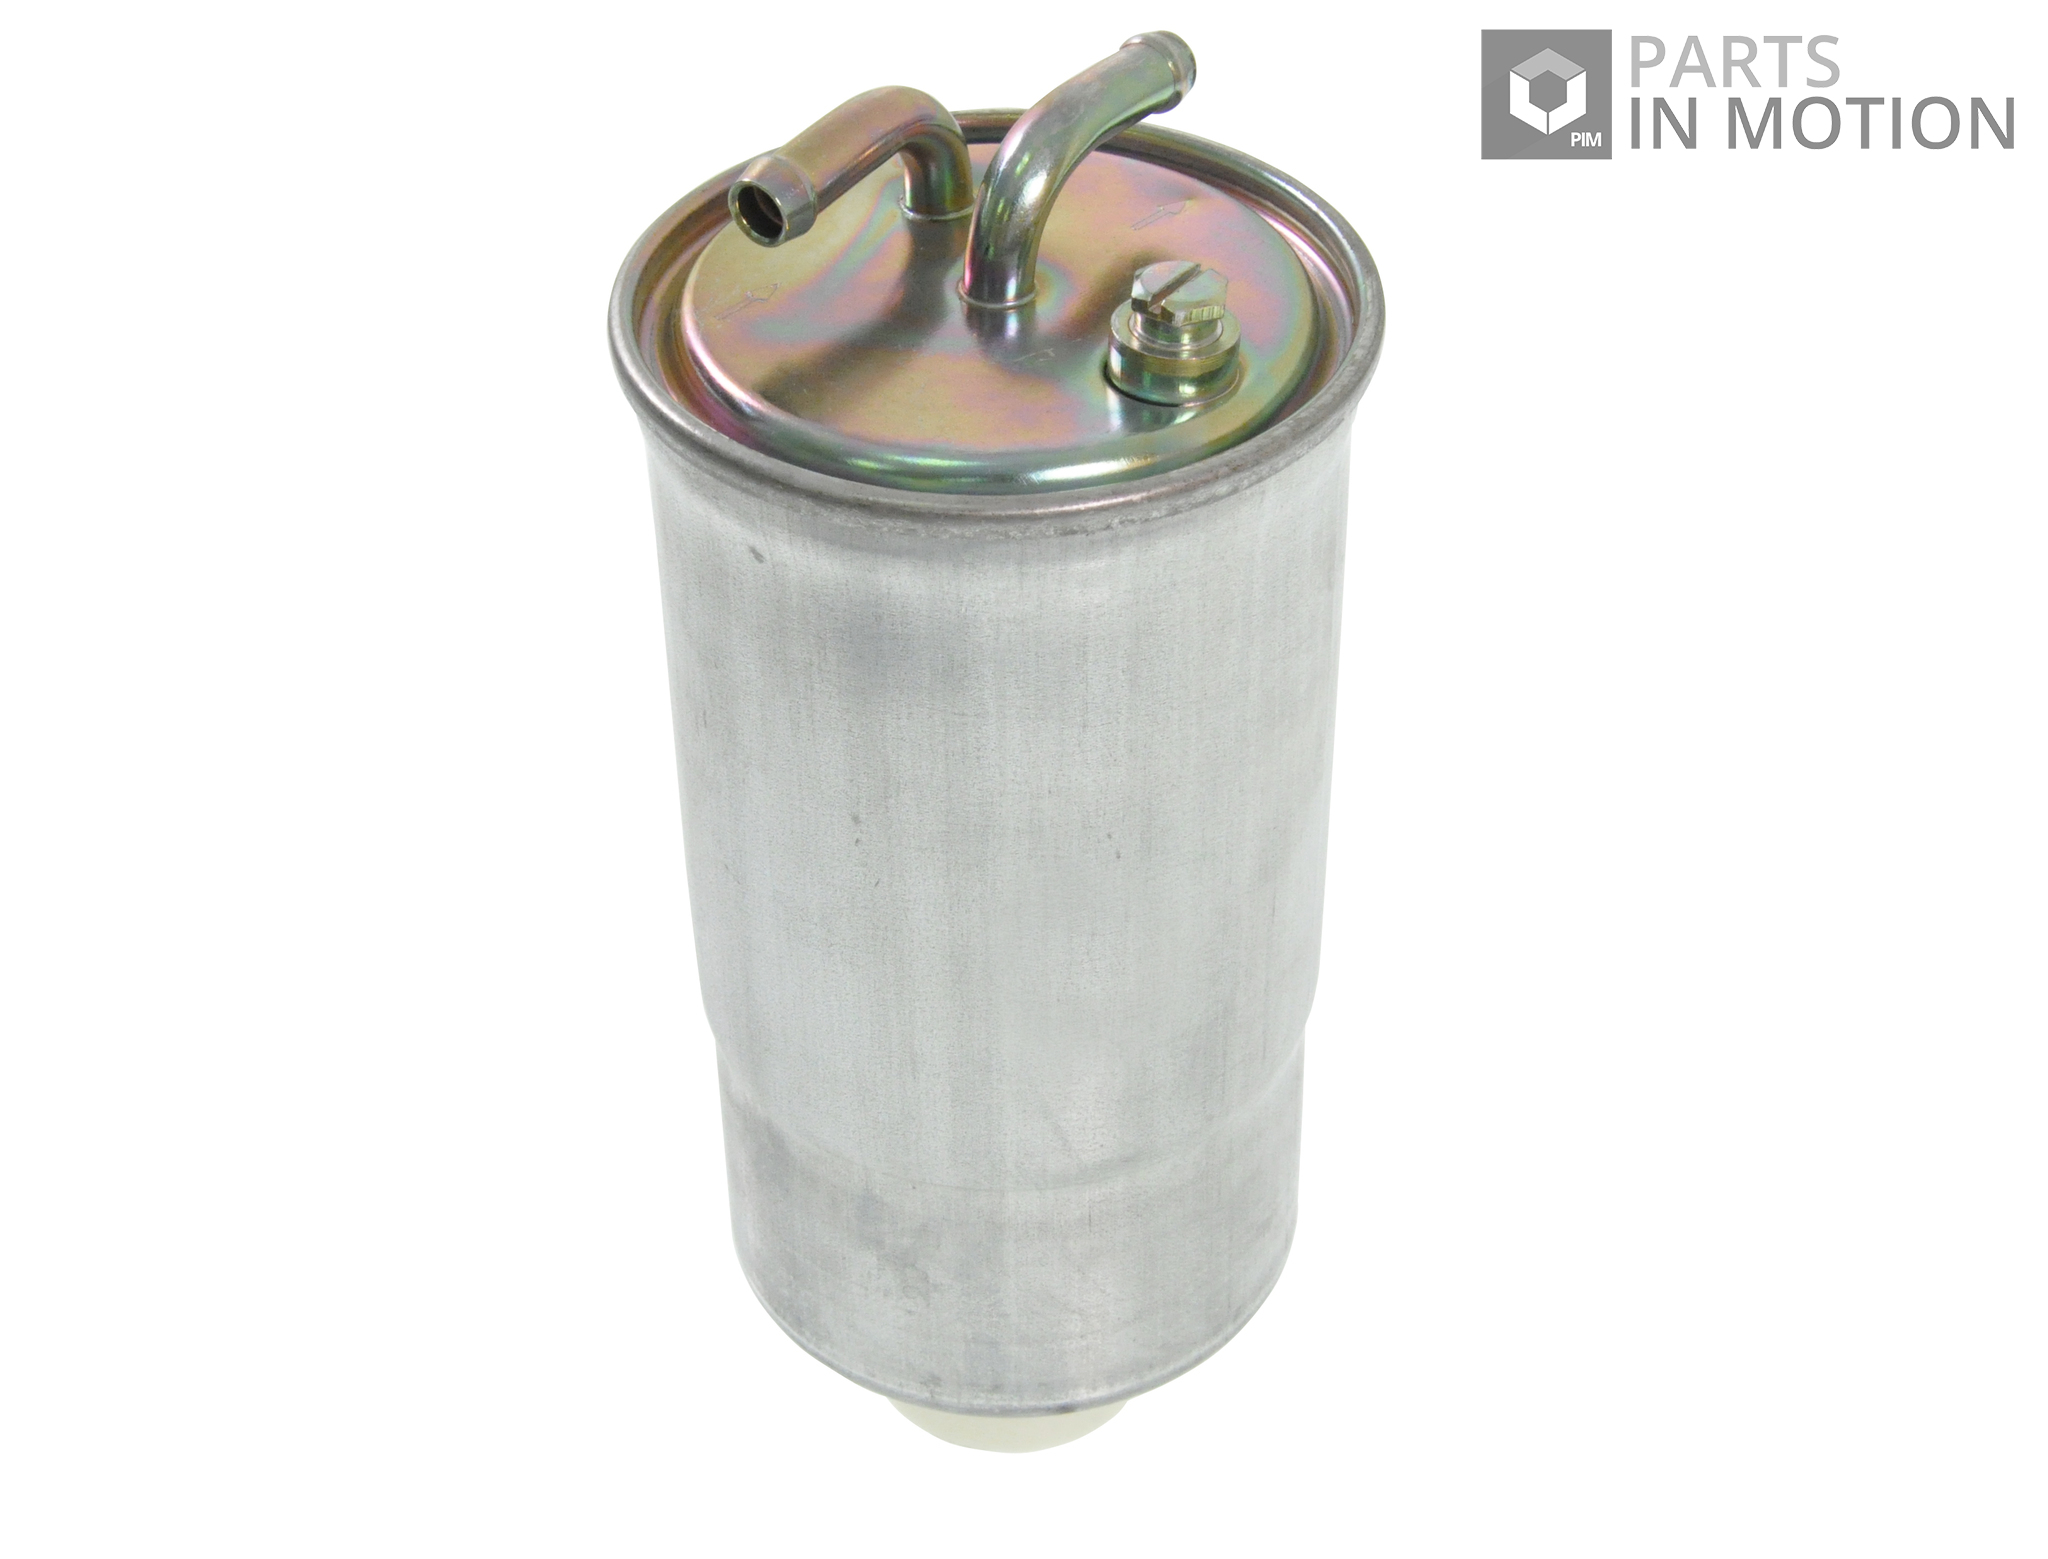 fuel filter fits honda accord mk8 2 2d 04 to 08 n22a1 adl. Black Bedroom Furniture Sets. Home Design Ideas